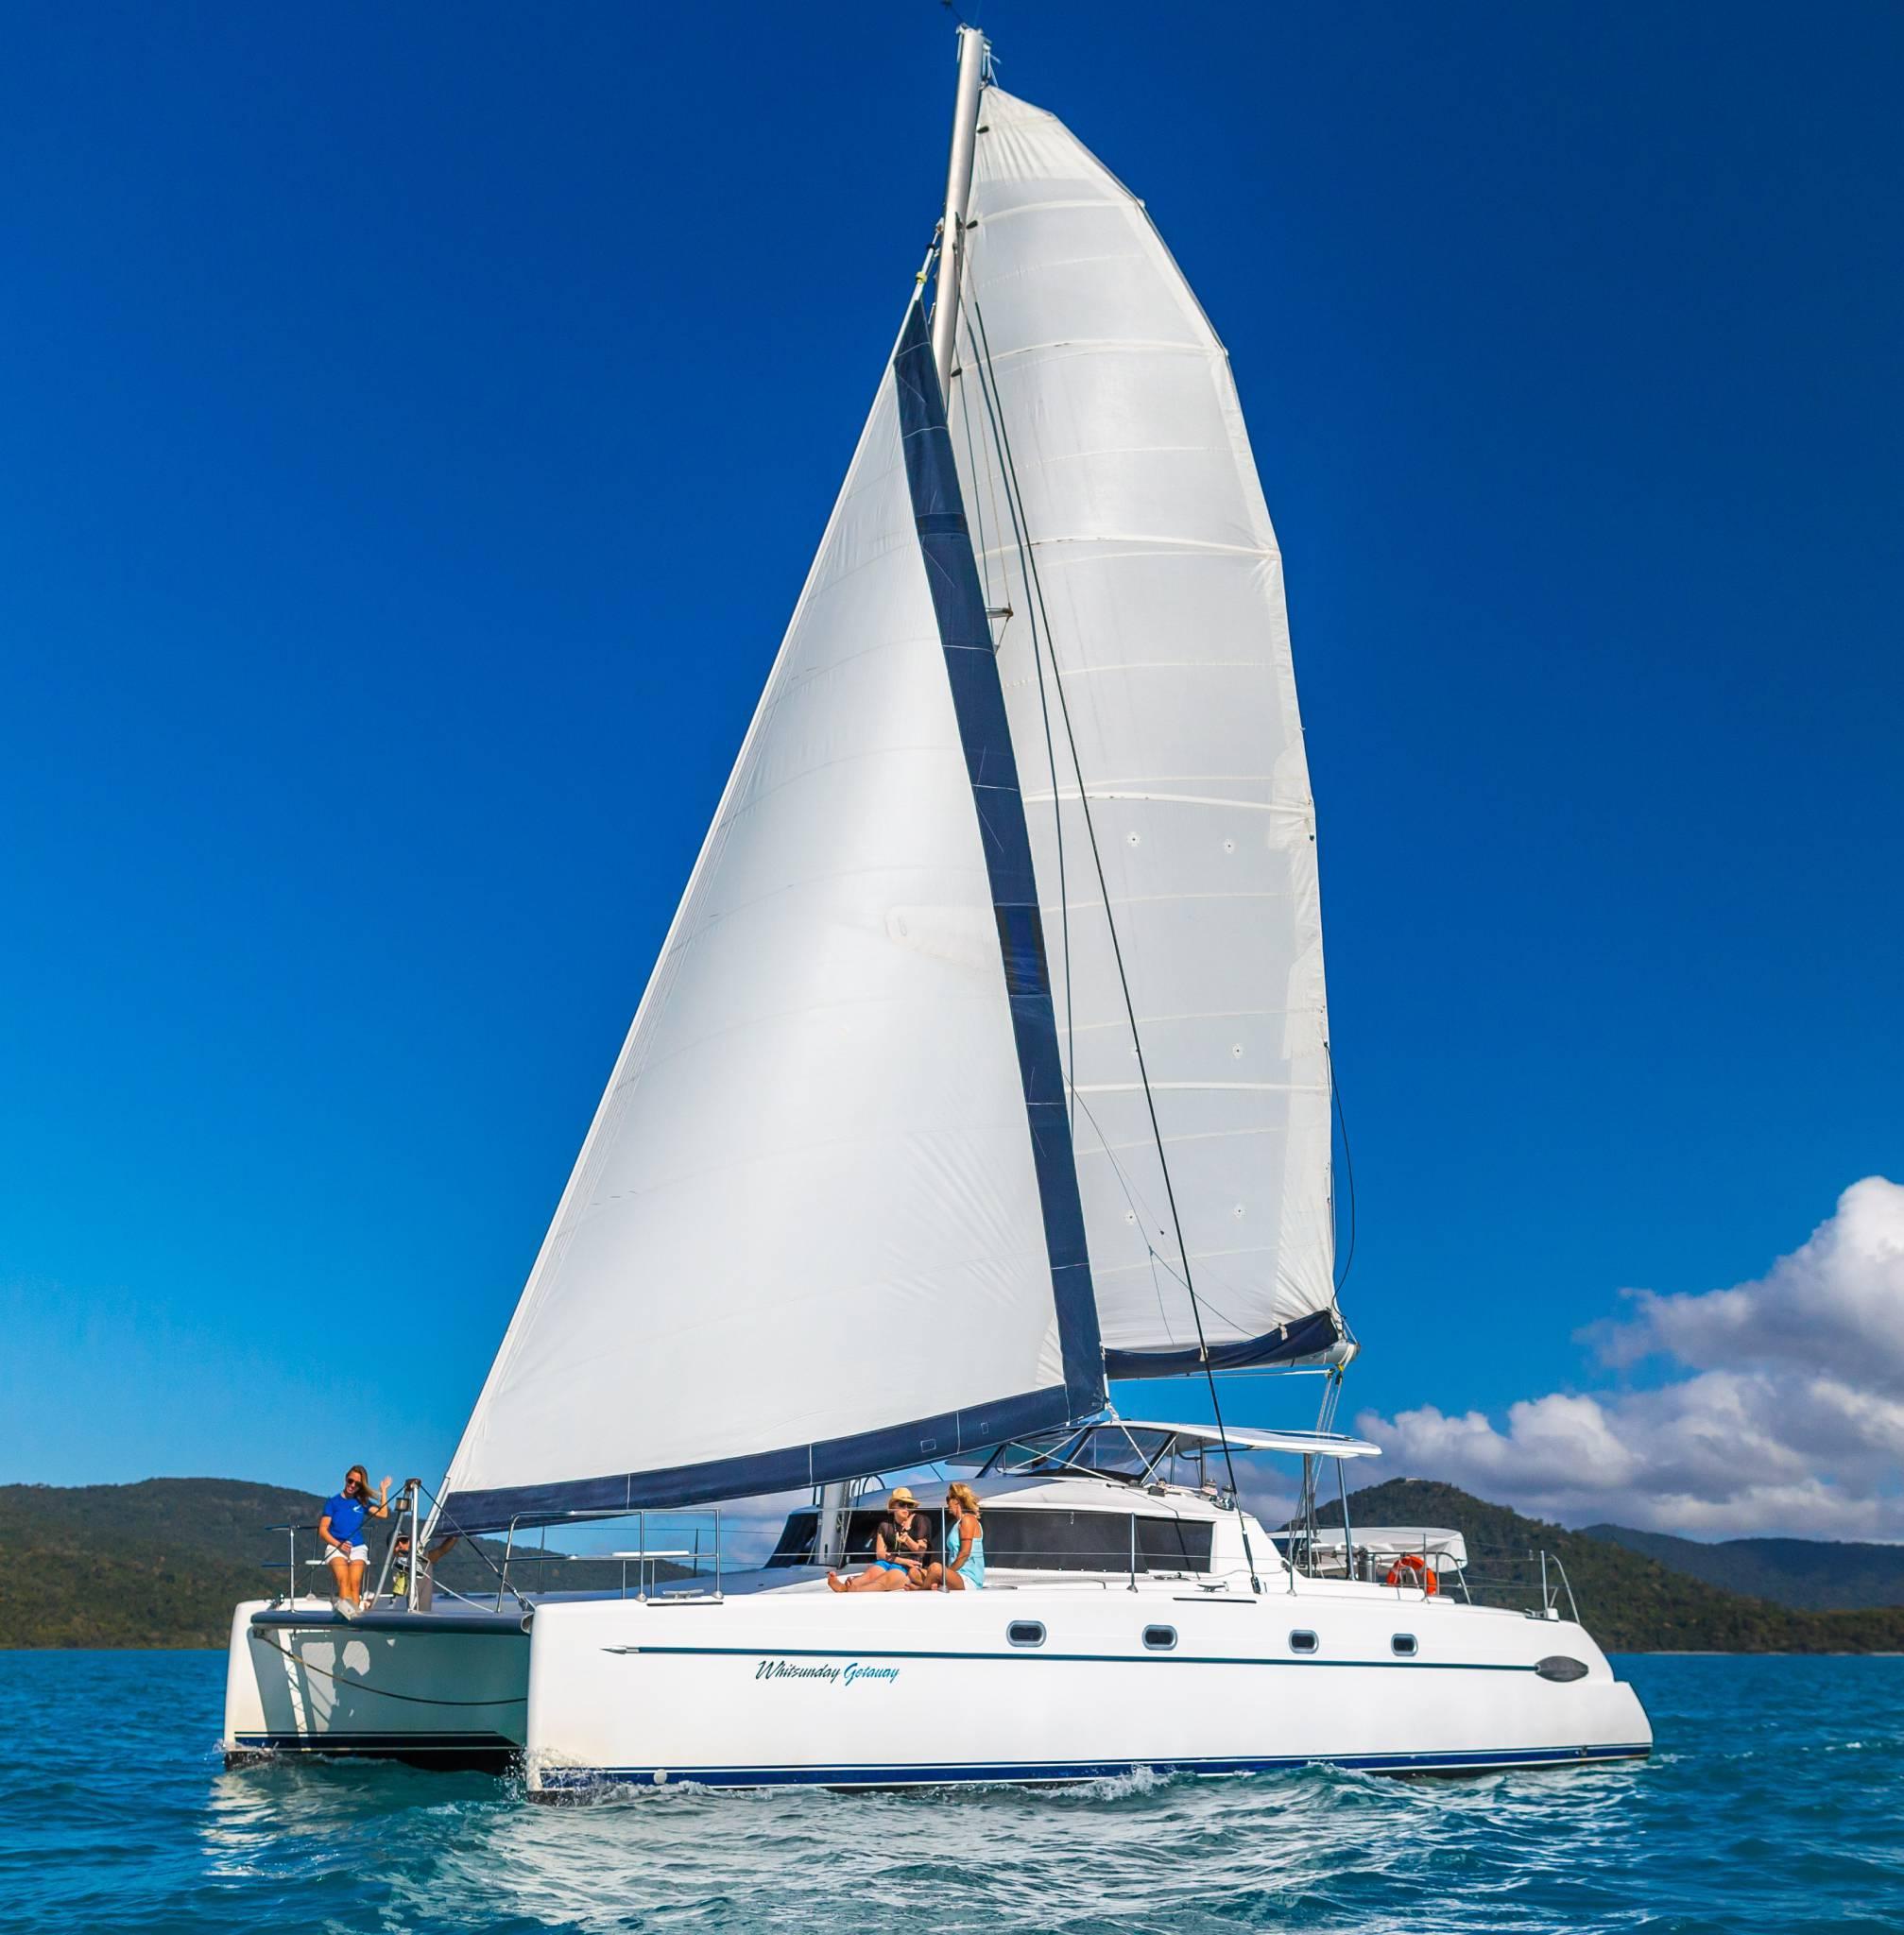 Whitsunday Getaway Catamaran Whitsunday Holidays